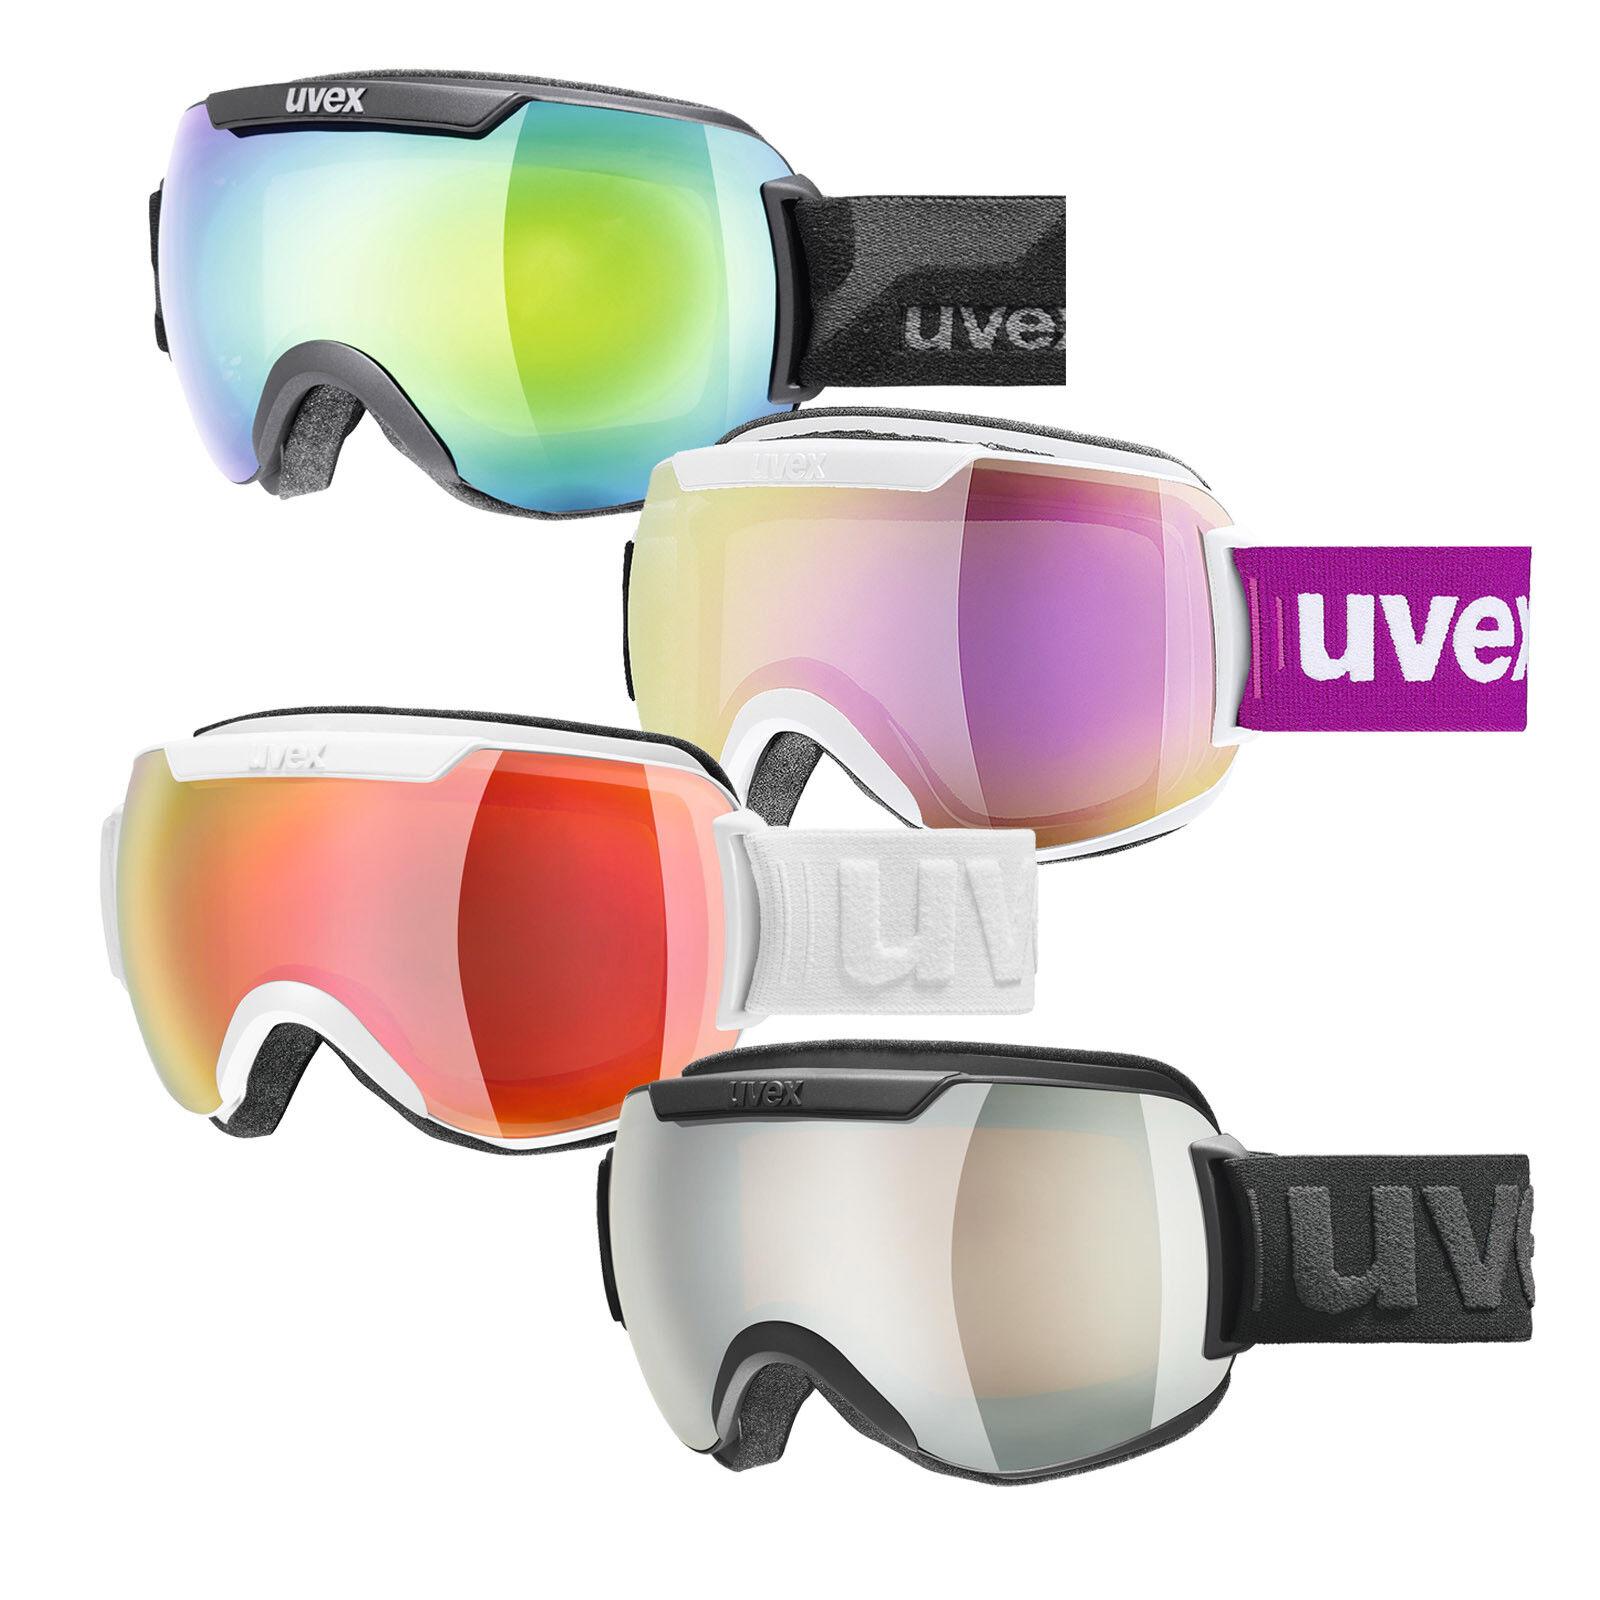 Uvex Downhill 2000FM - Frameless Ski Goggles   save up to 70%